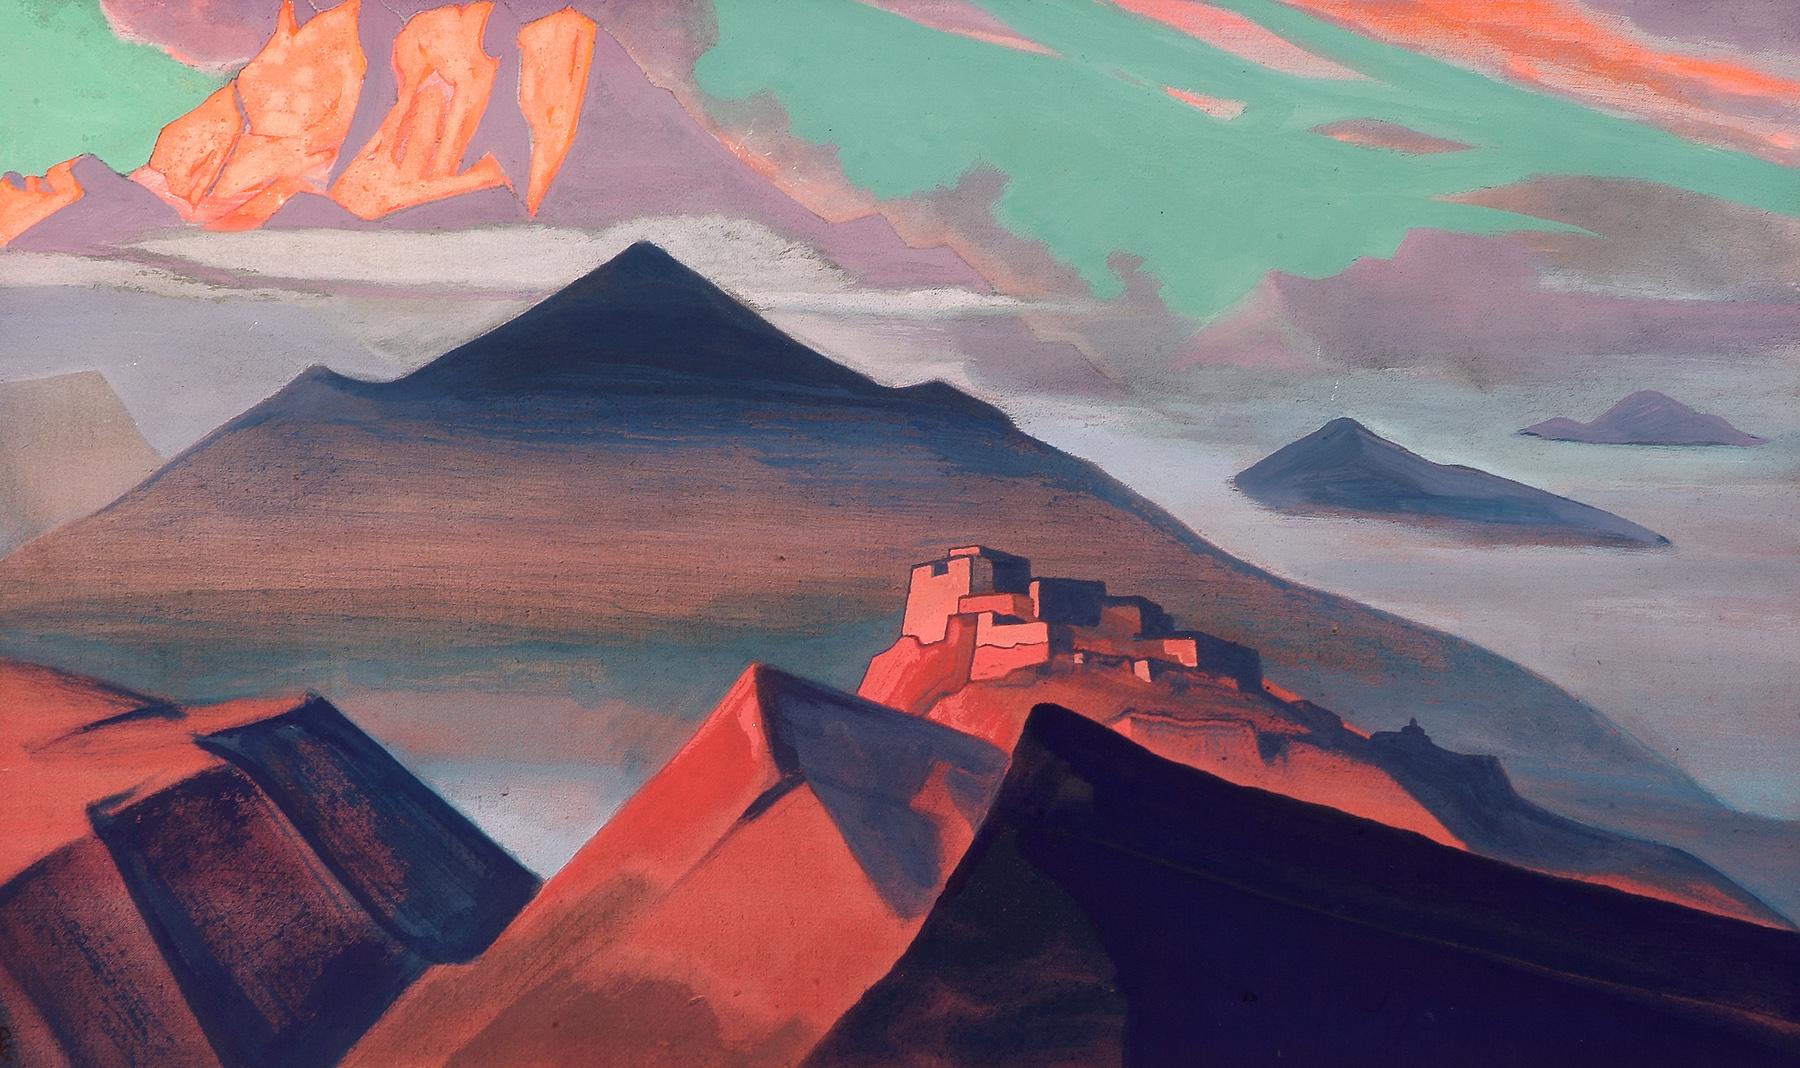 Tent Mountain 1933 - Nicholas Roerich & Tent Mountain 1933 - Nicholas Roerich - WikiArt.org